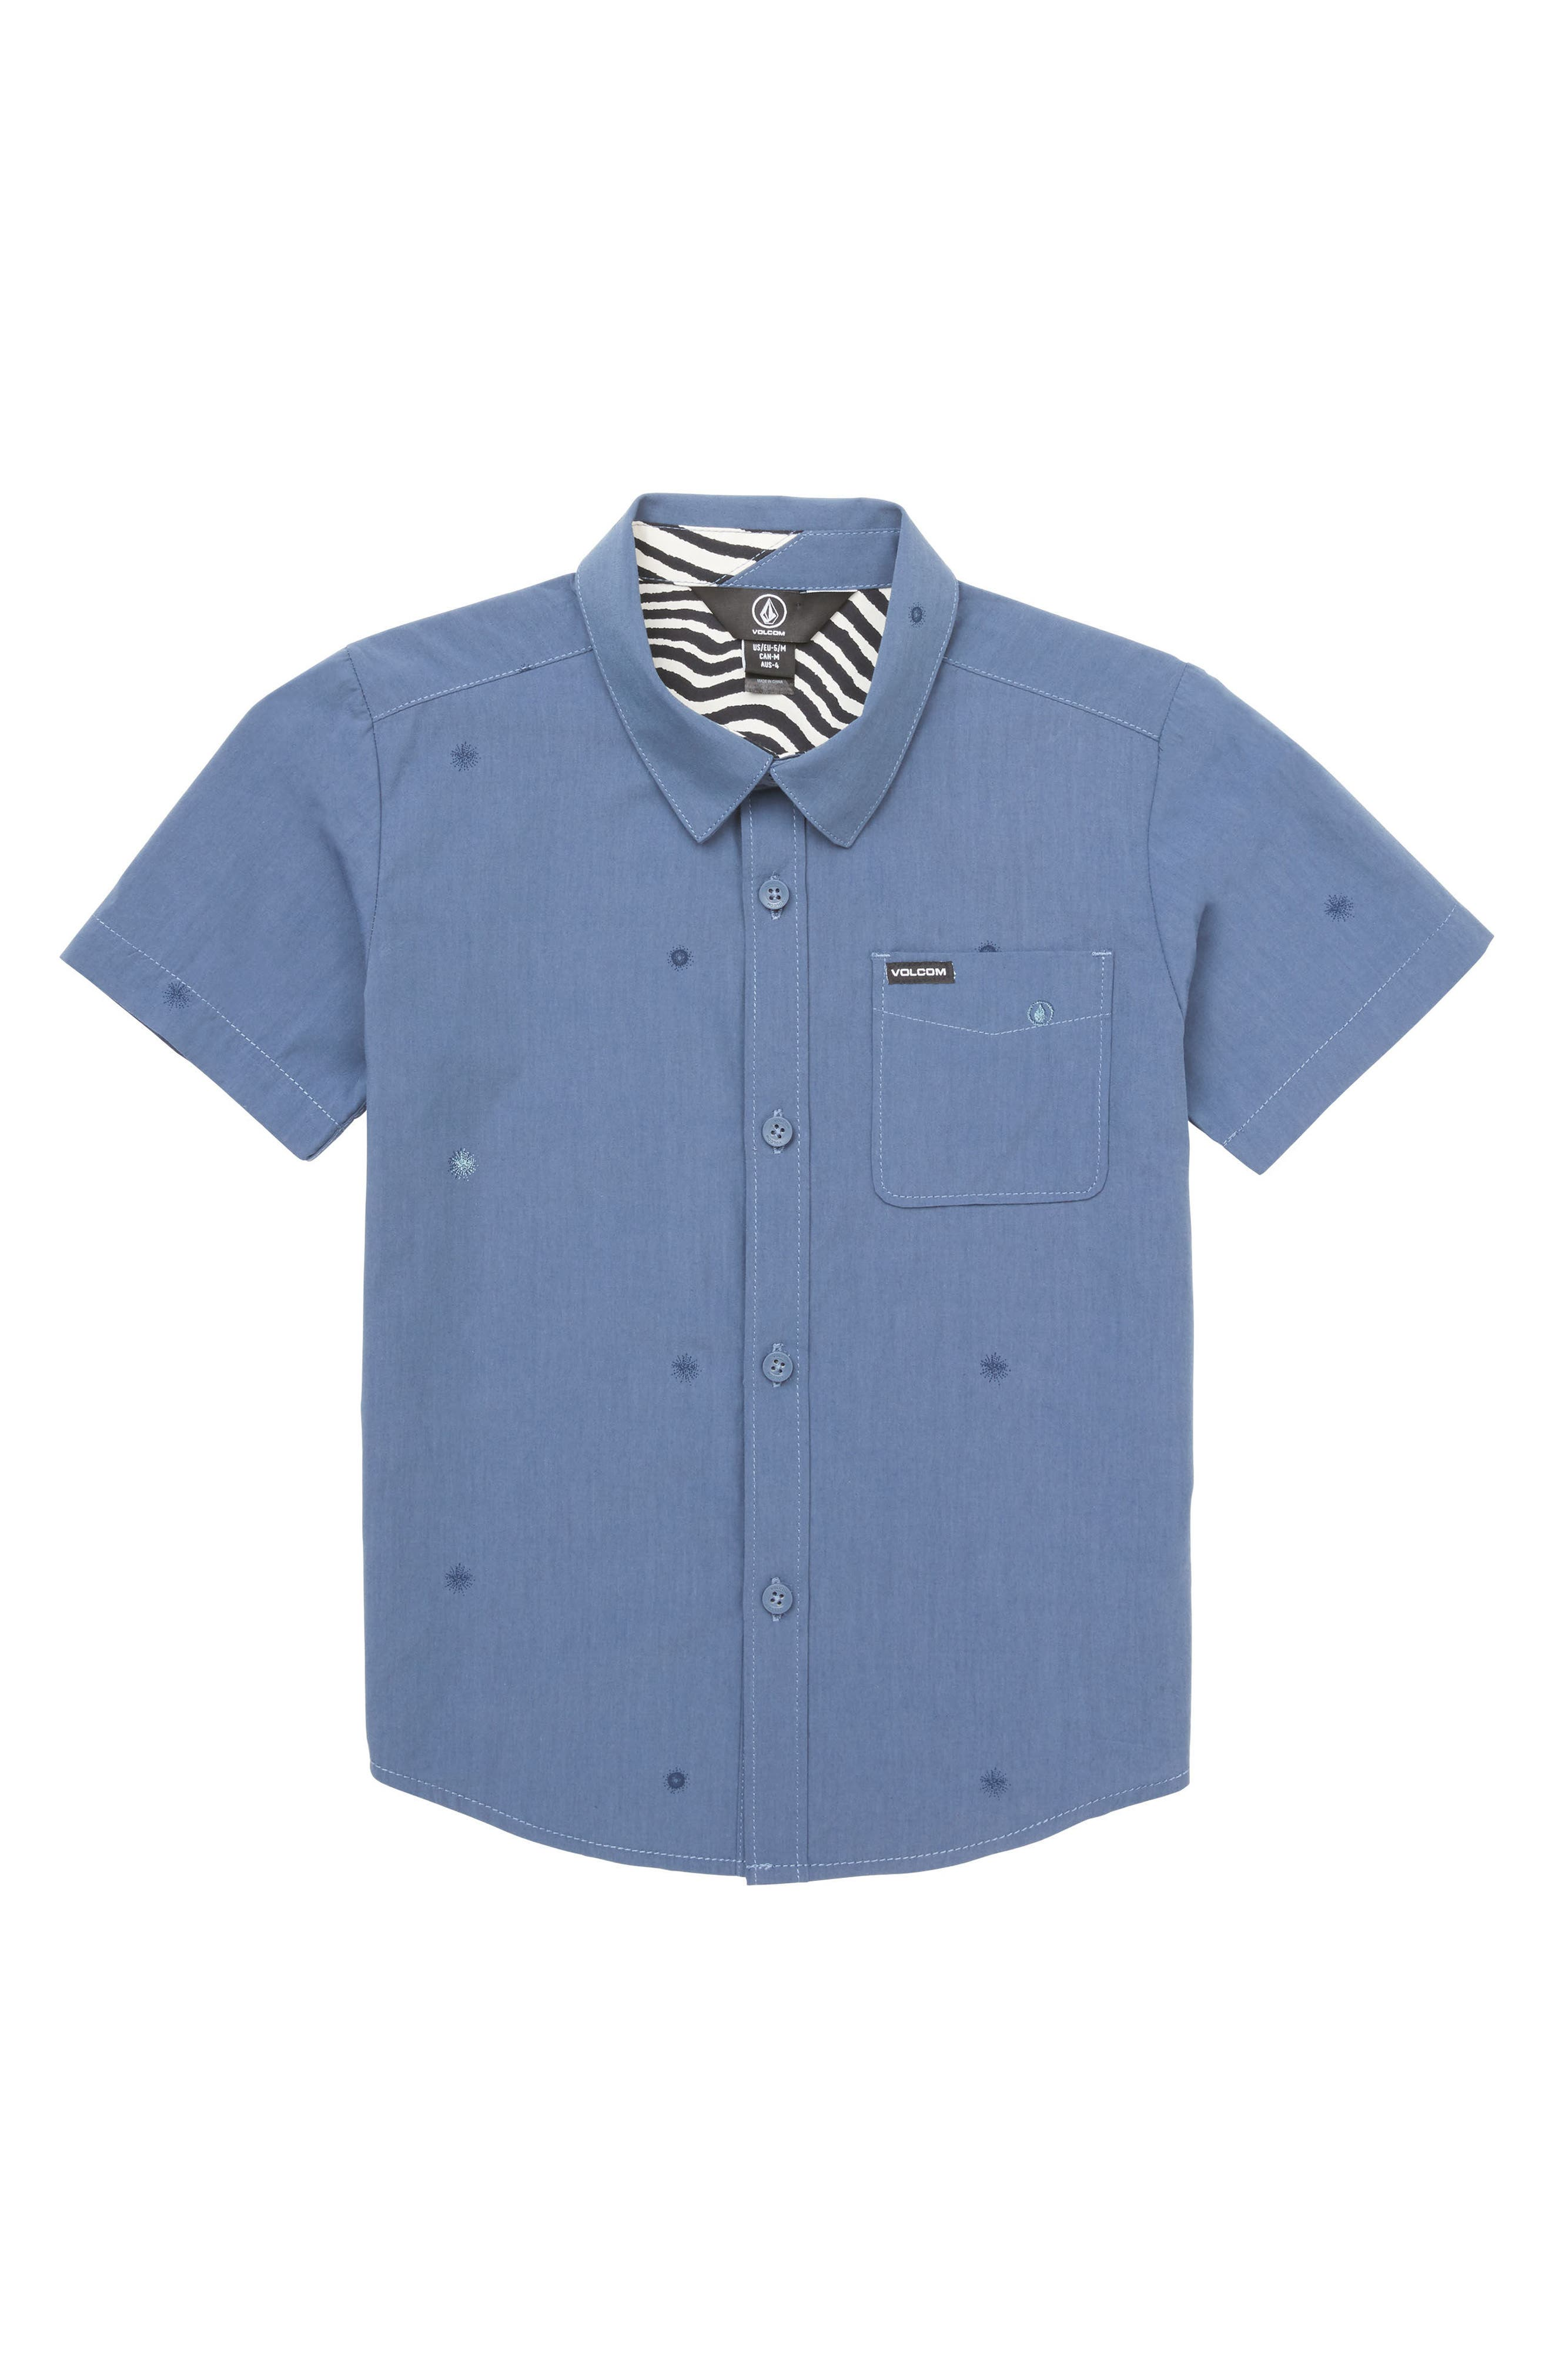 Bleeker Woven Shirt,                             Main thumbnail 1, color,                             463